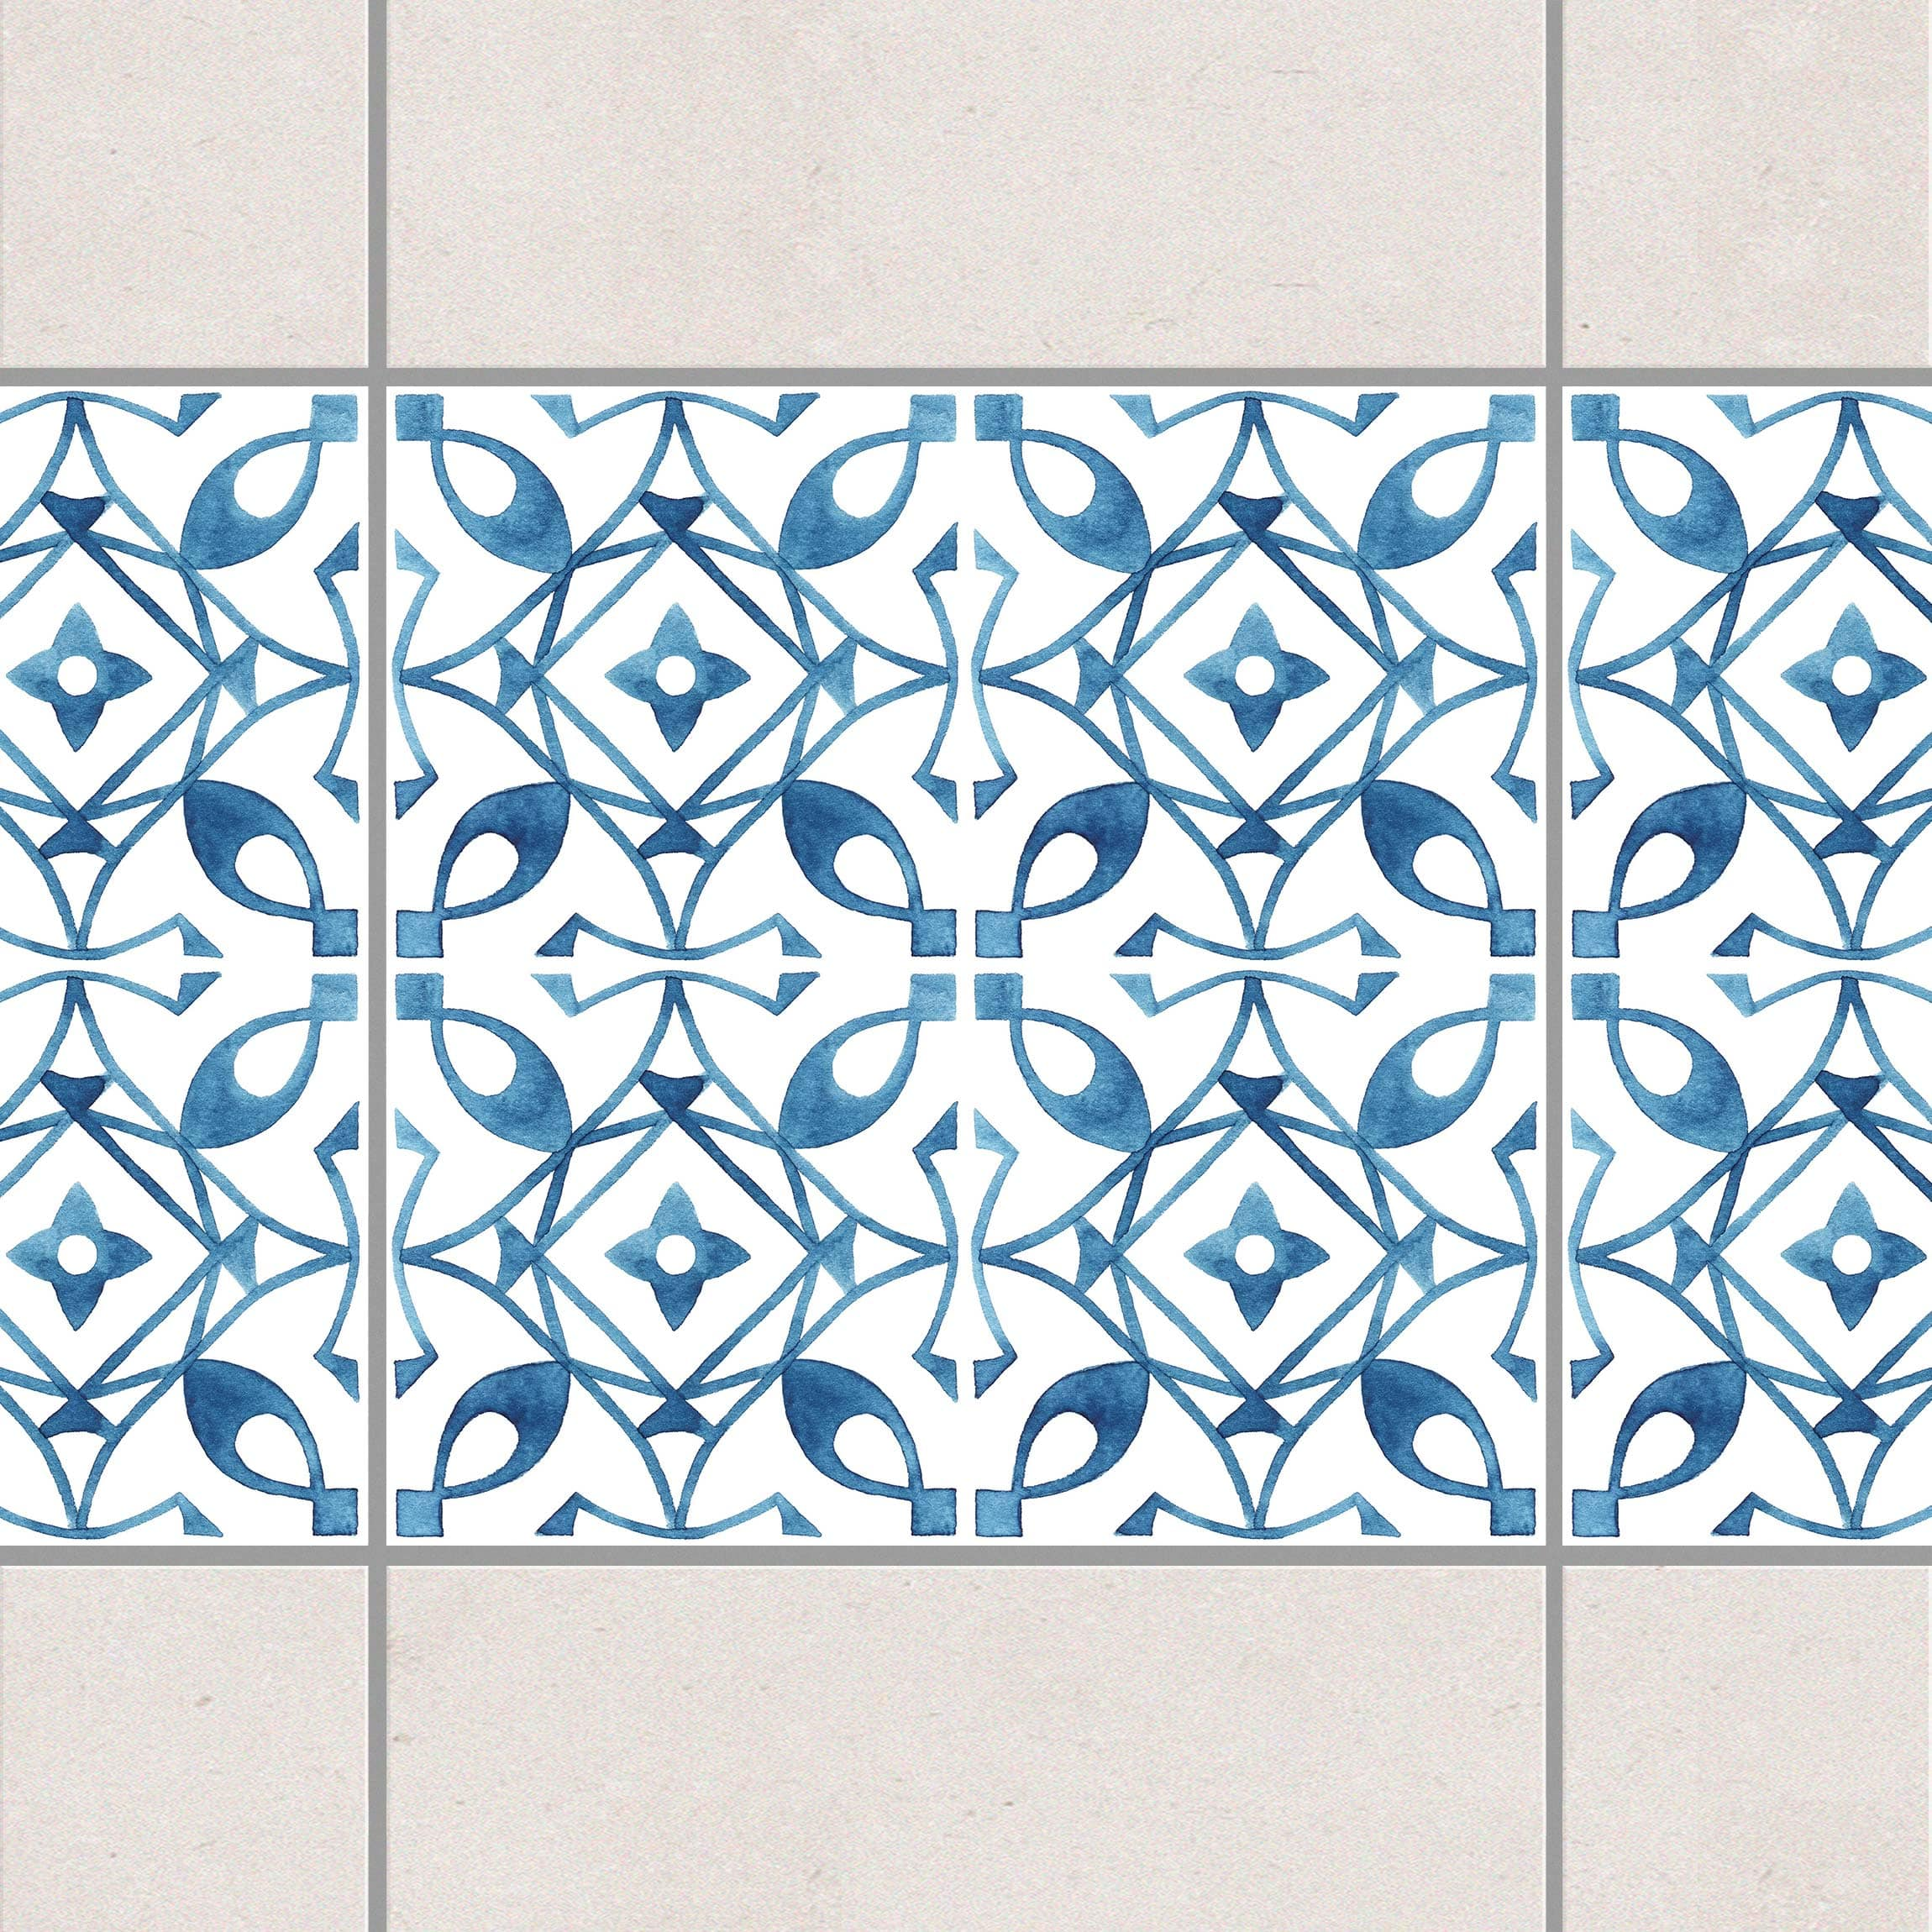 fliesen bord re blau wei muster serie no 8 1 1 quadrat 20cm x 20cm fliesenaufkleber. Black Bedroom Furniture Sets. Home Design Ideas